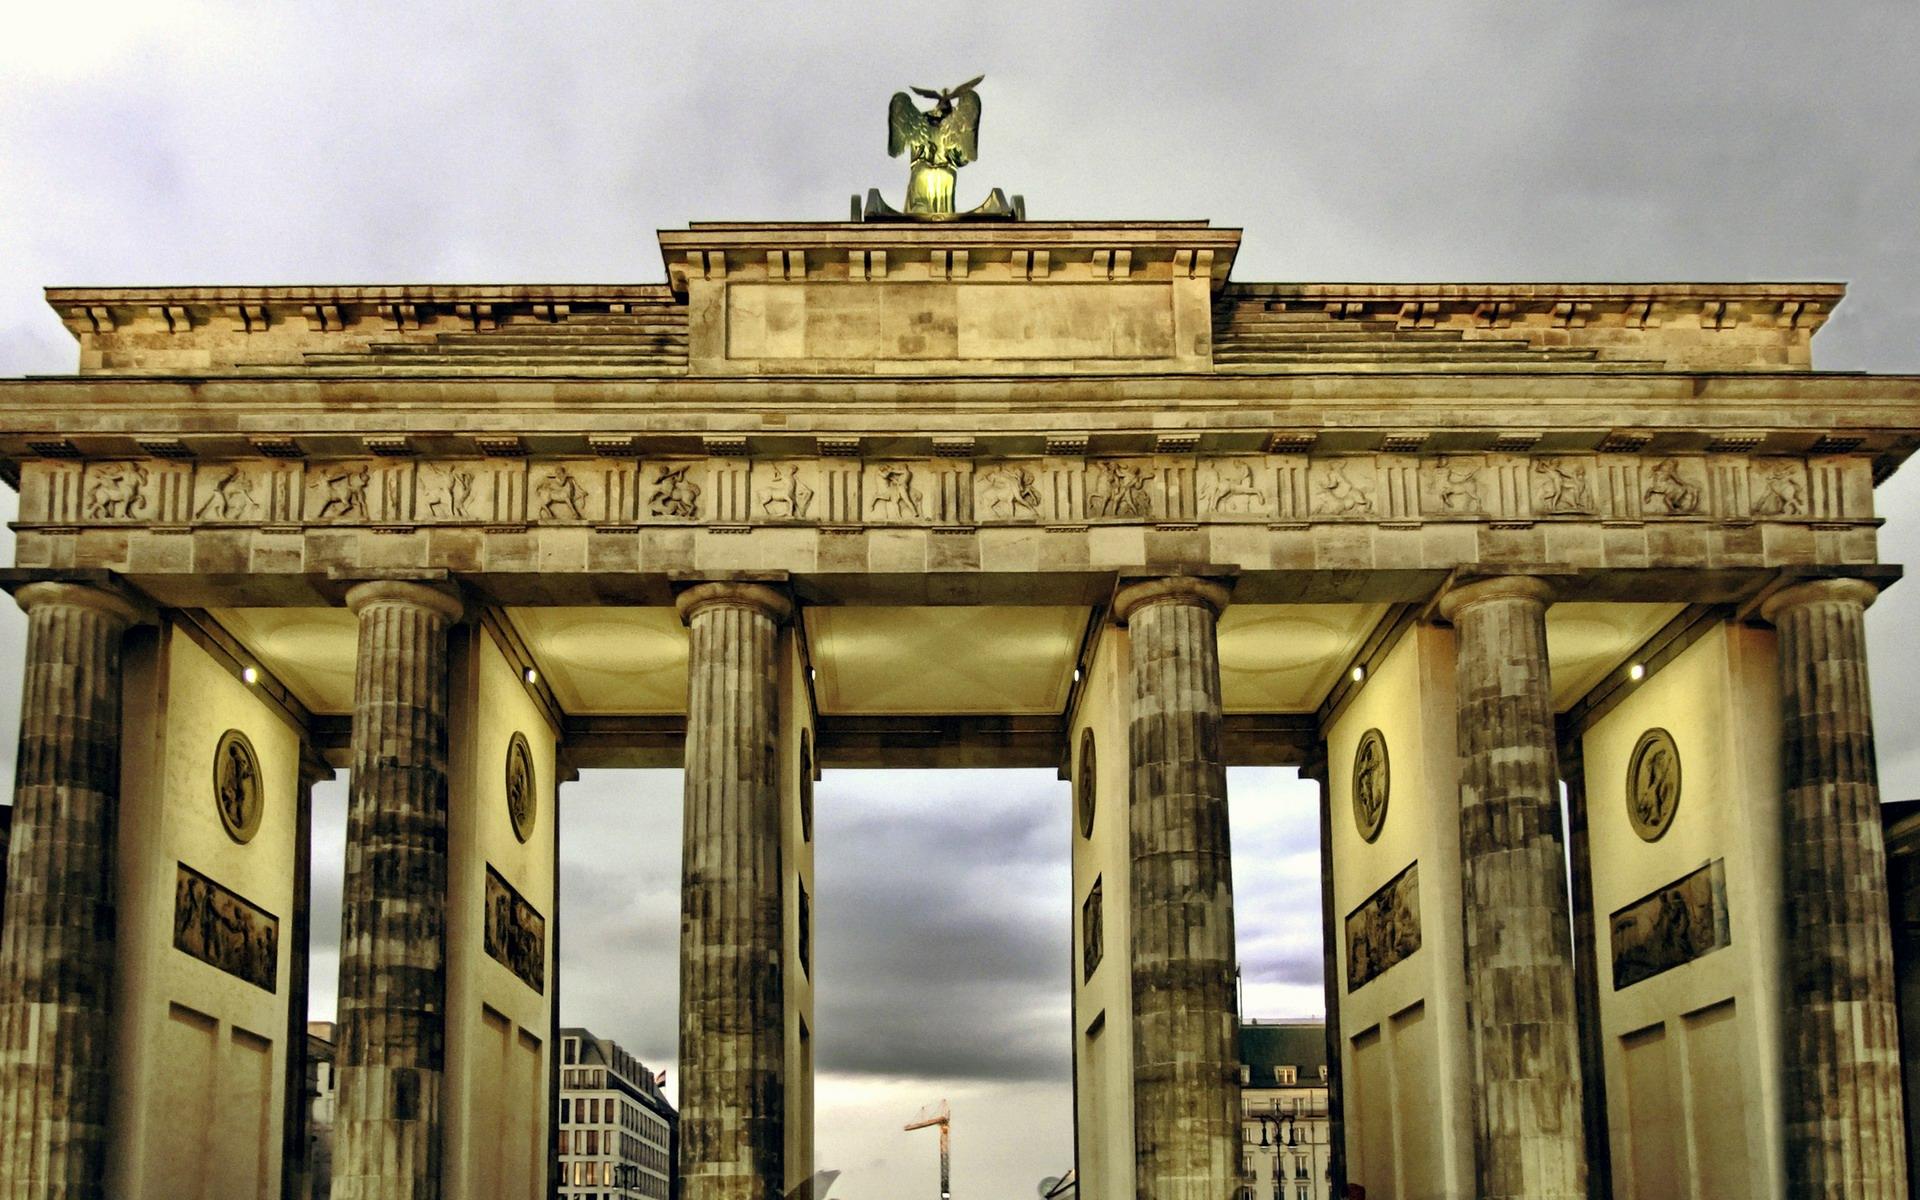 Brandenburg Gate Wallpapers and Background Images   stmednet 1920x1200